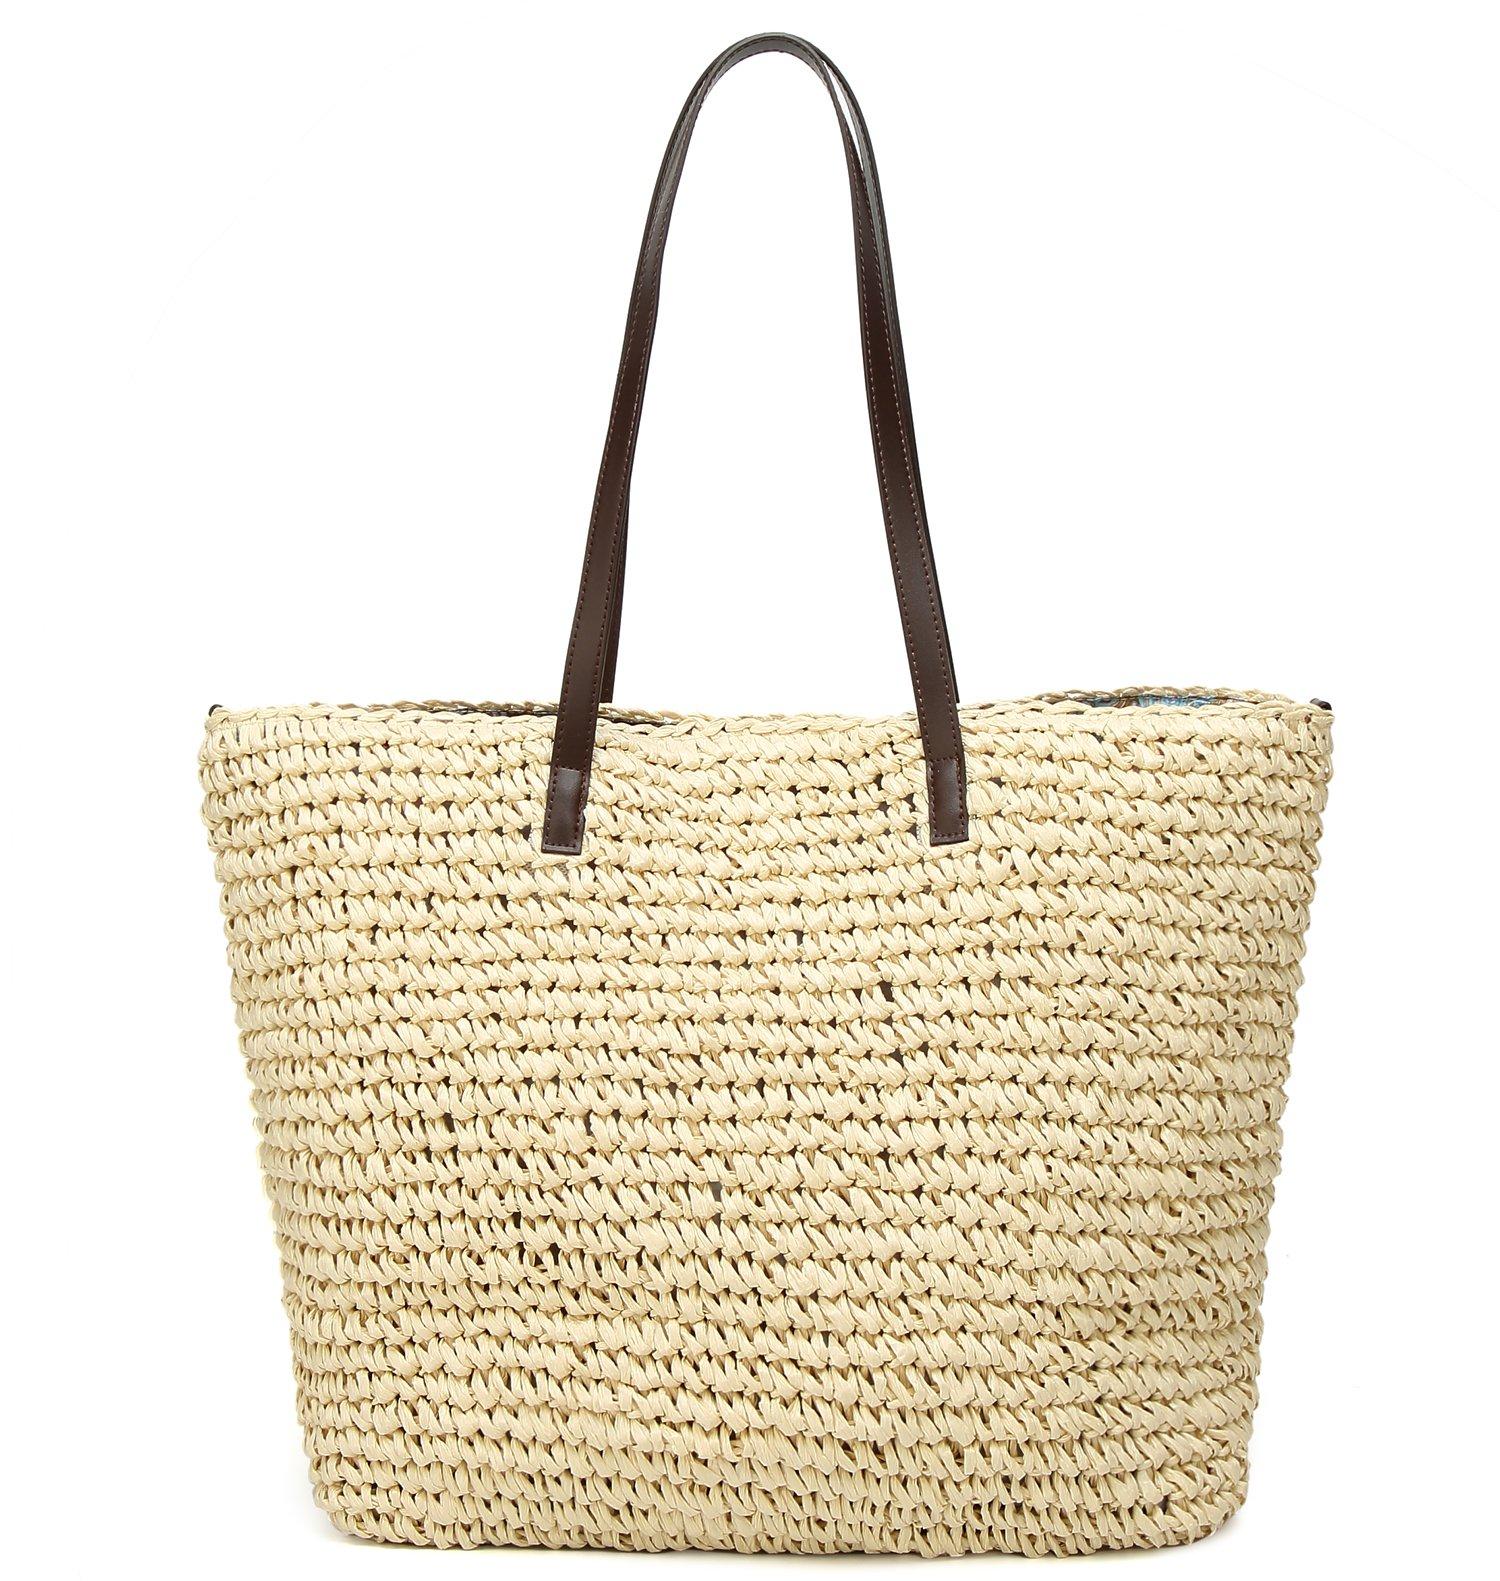 Obosoyo Women's Classic Straw Handbag Summer Beach Sea Shoulder Bag Large Tote (Beige1)